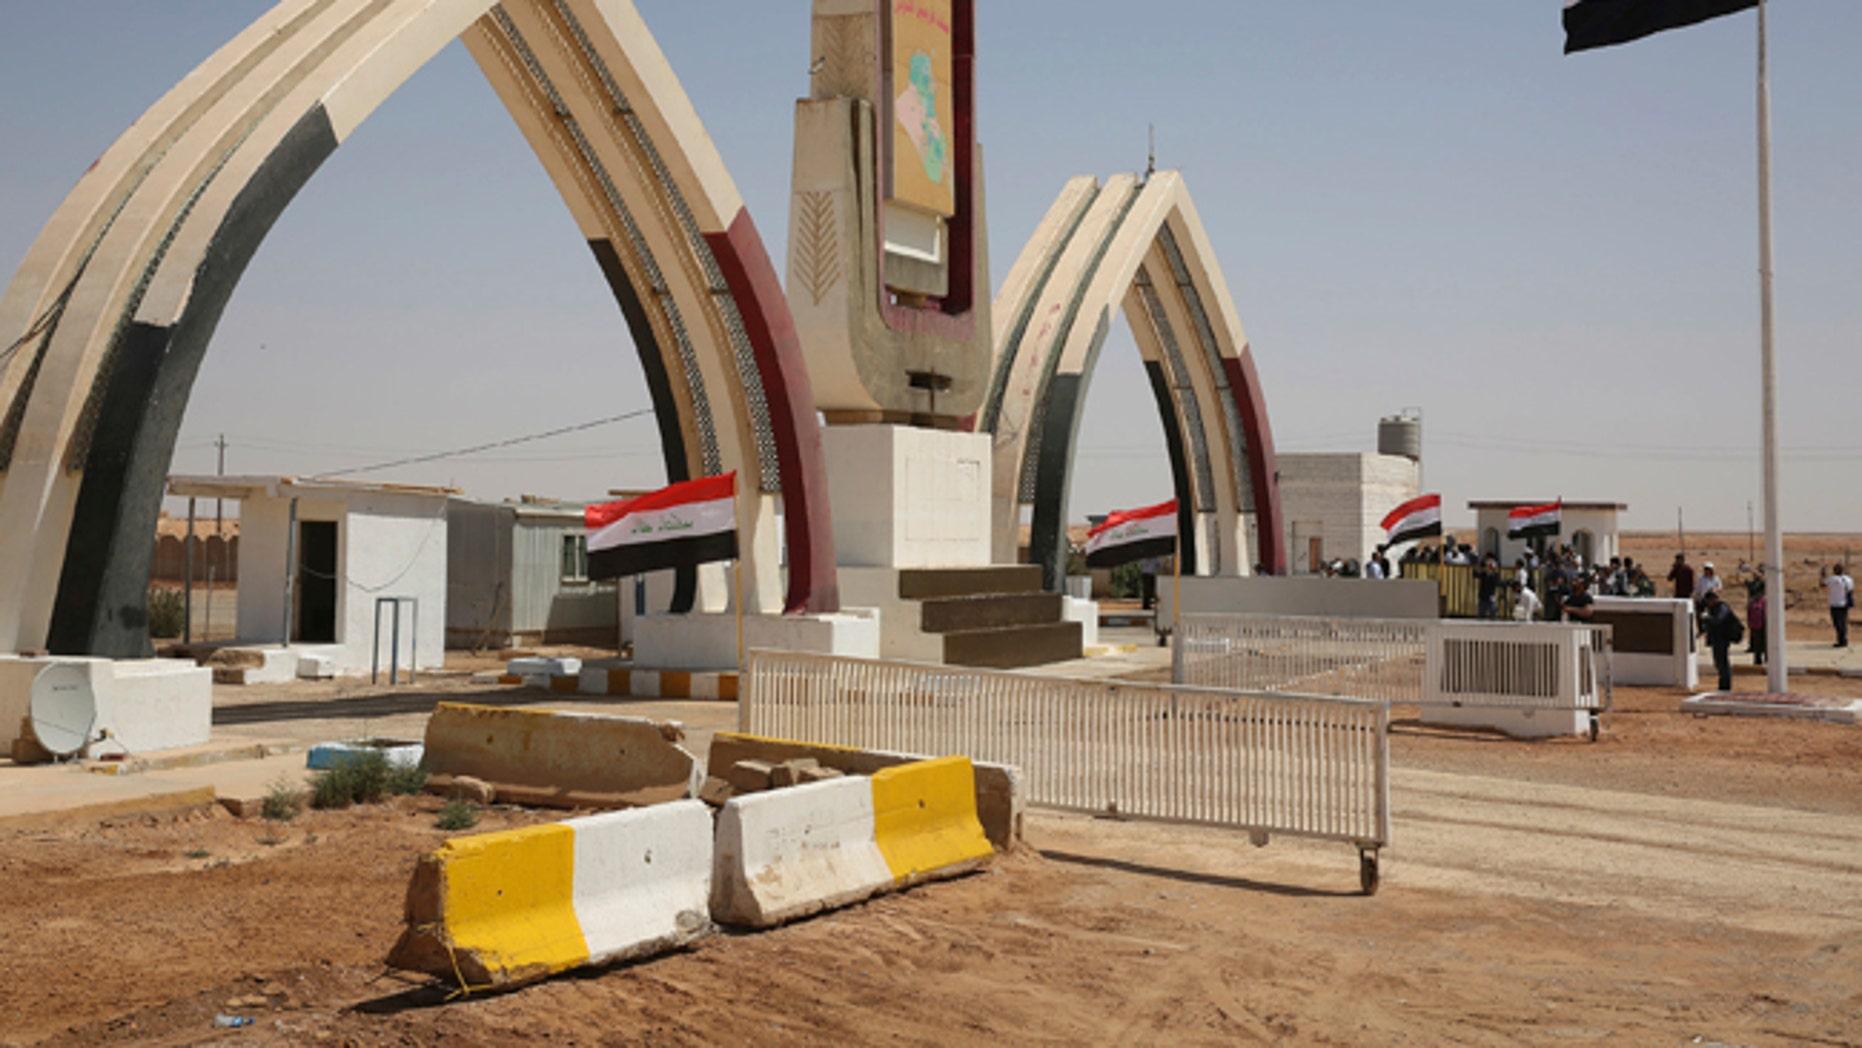 Iraqi flags fly at the recently opened Iraqi Trebil border crossing on the Iraq-Jordan border on Aug. 30, 2017.